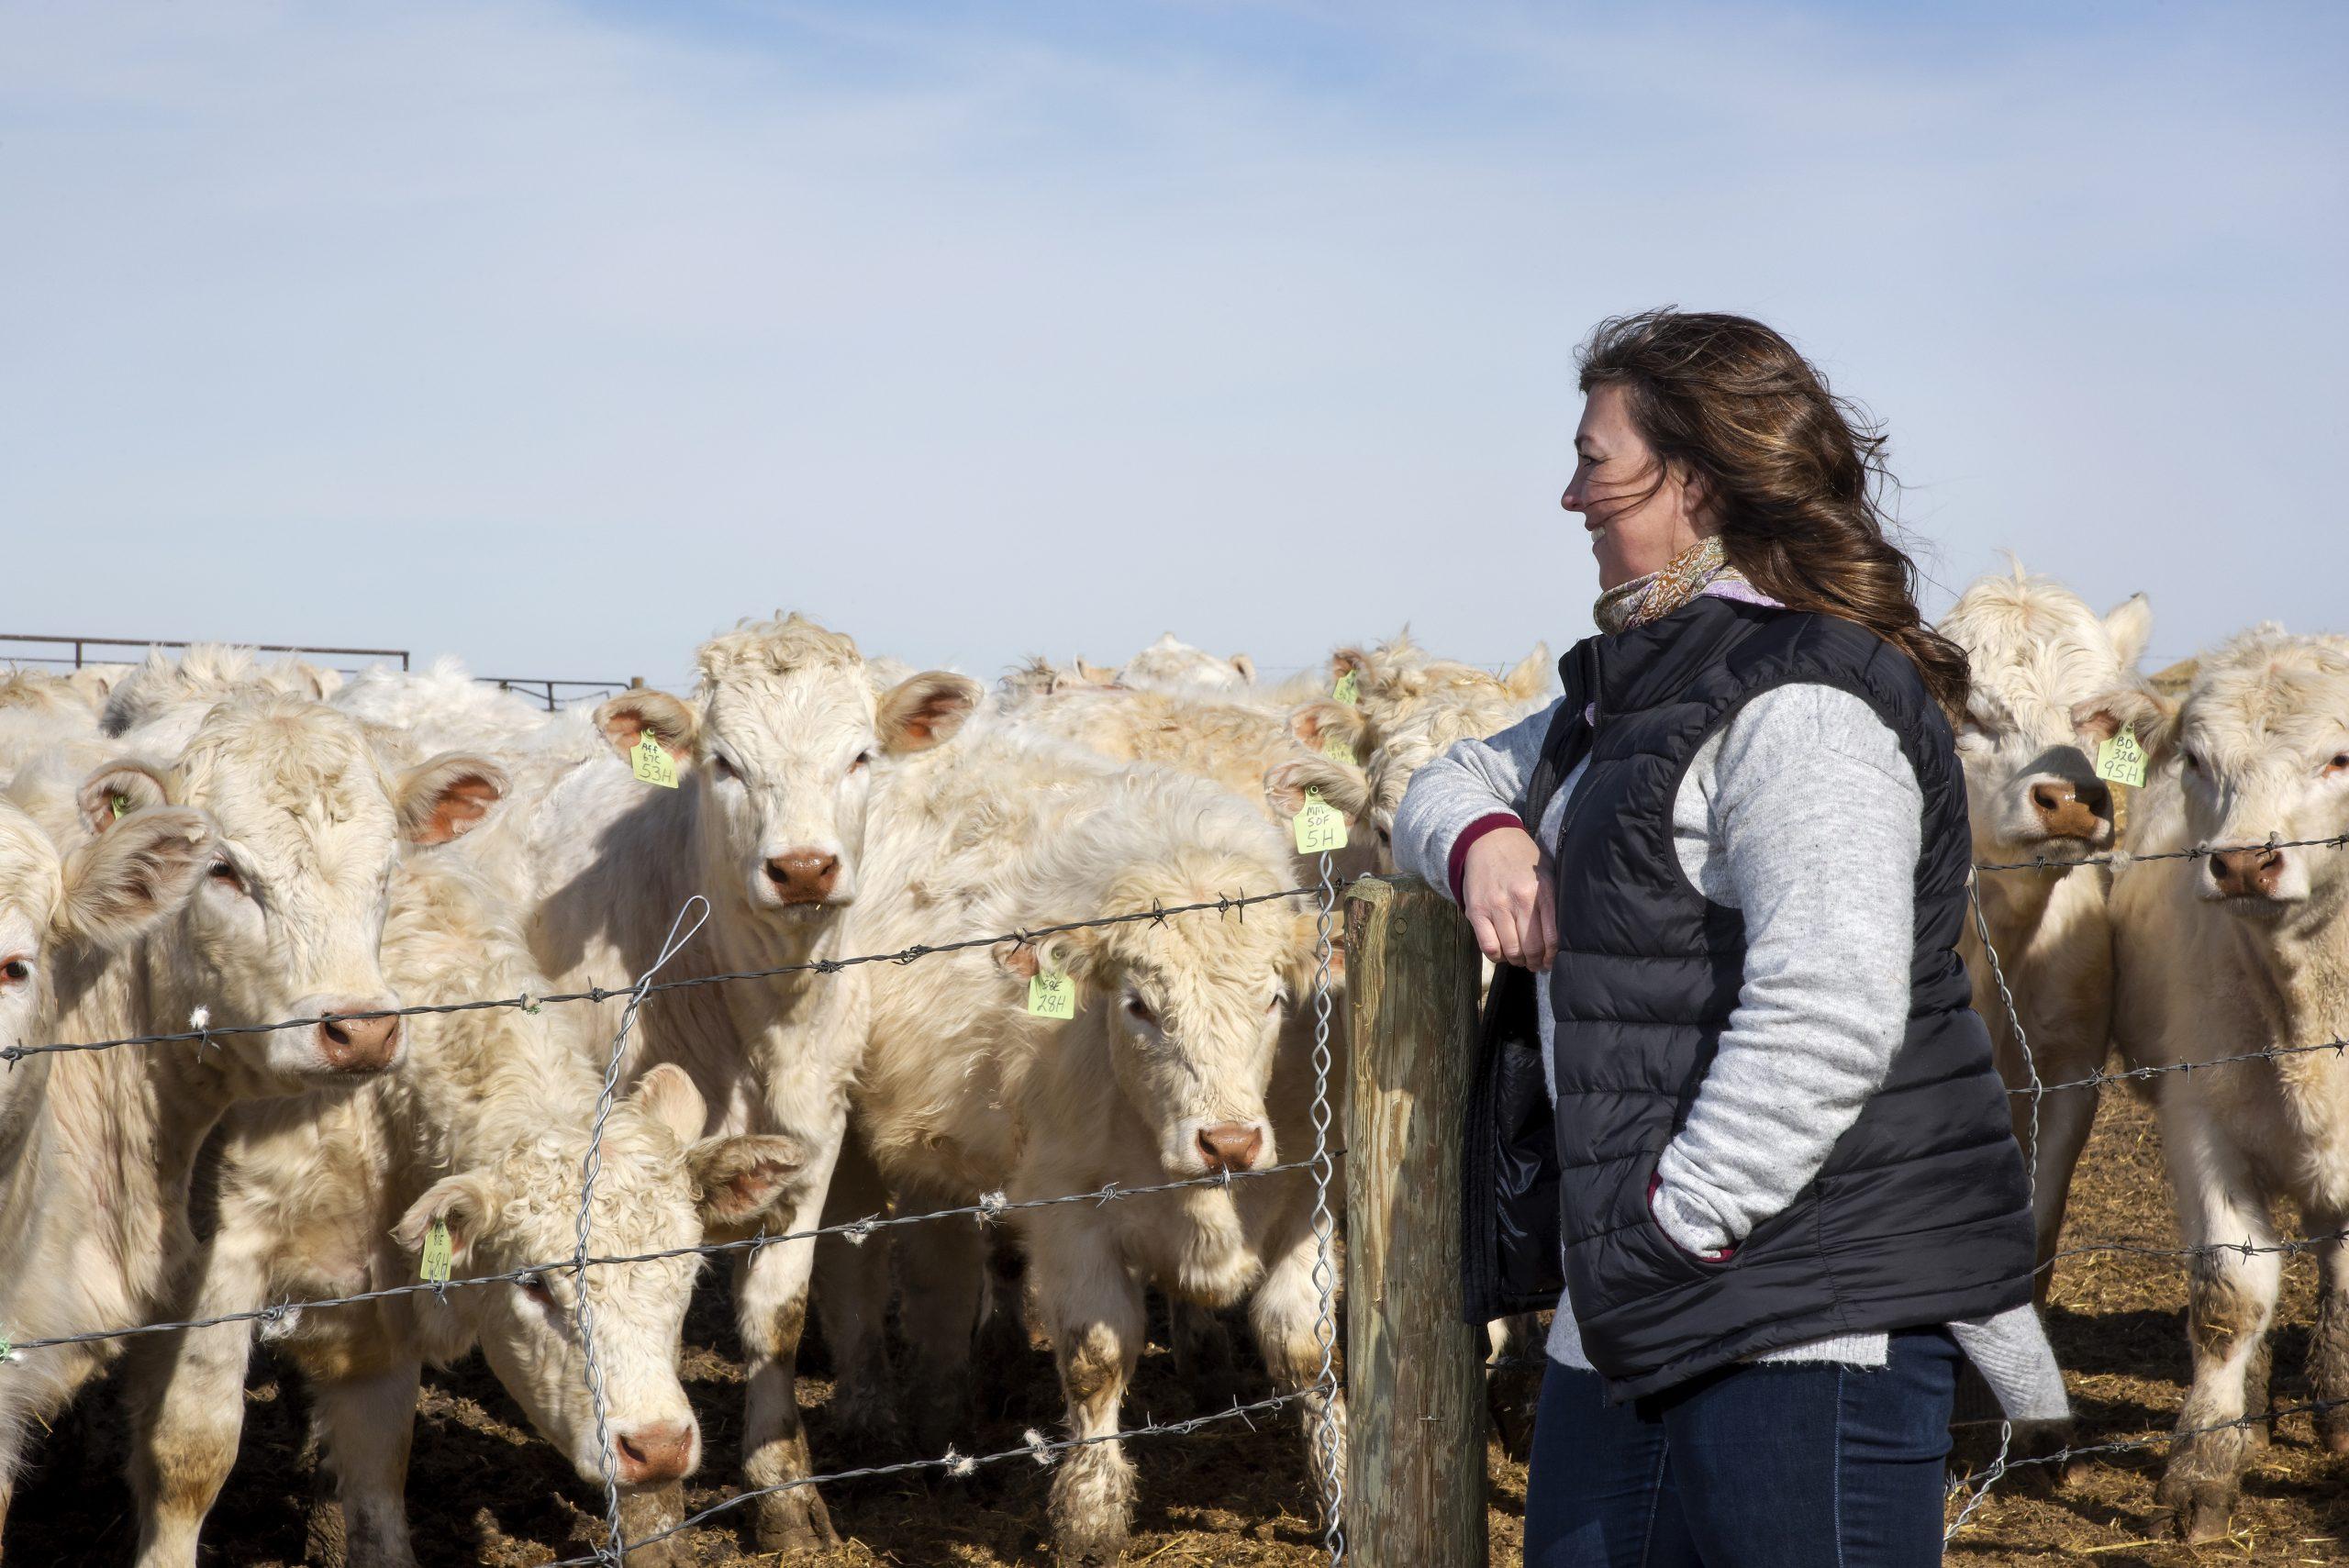 Beck on her farm south of Regina. (Photo by Trevor Hopkin)